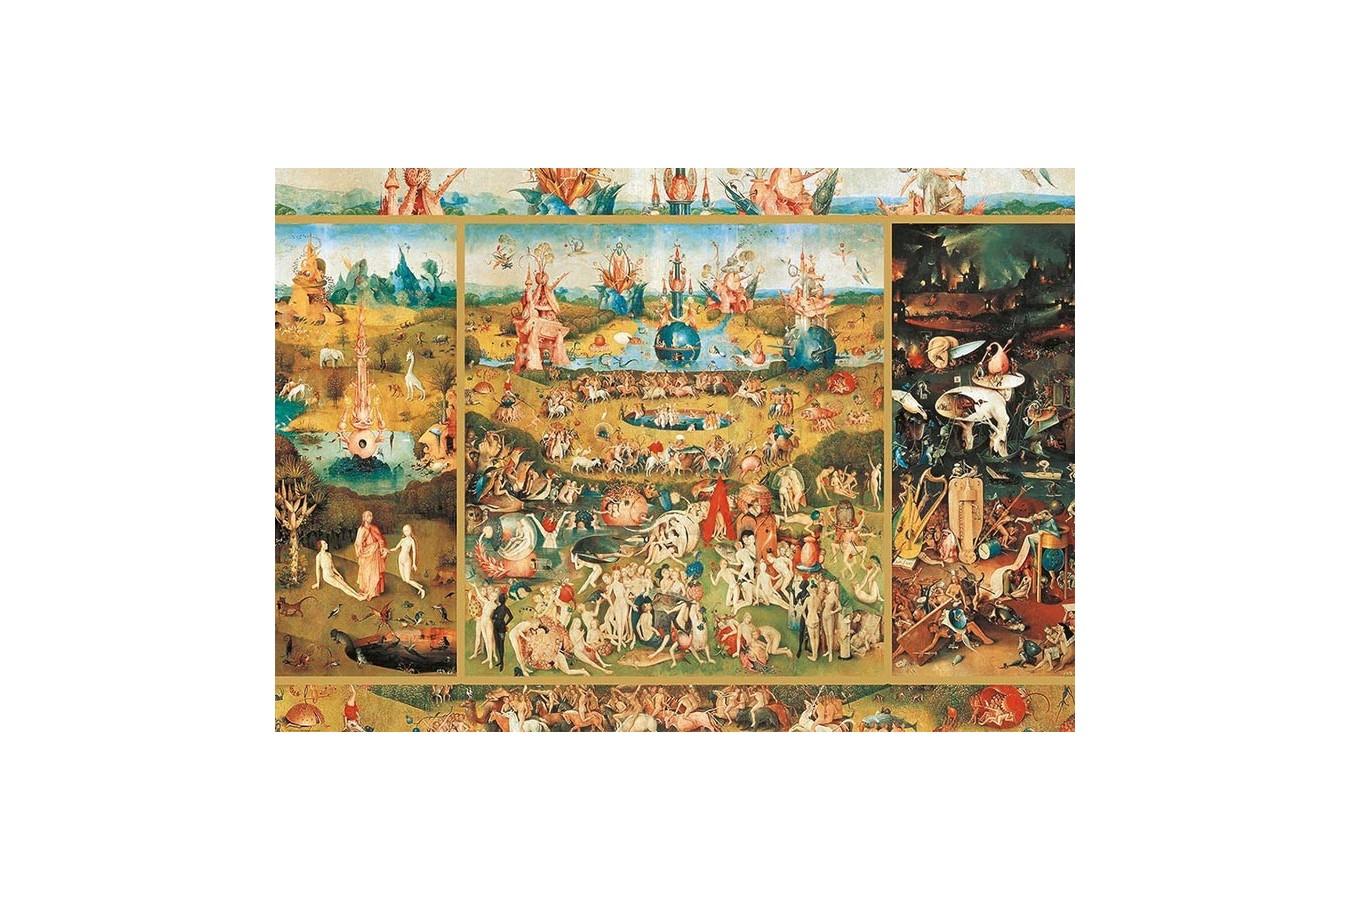 Puzzle Educa - Hieronymus Bosch: The Garden Of Delights, 2.000 piese (18505)